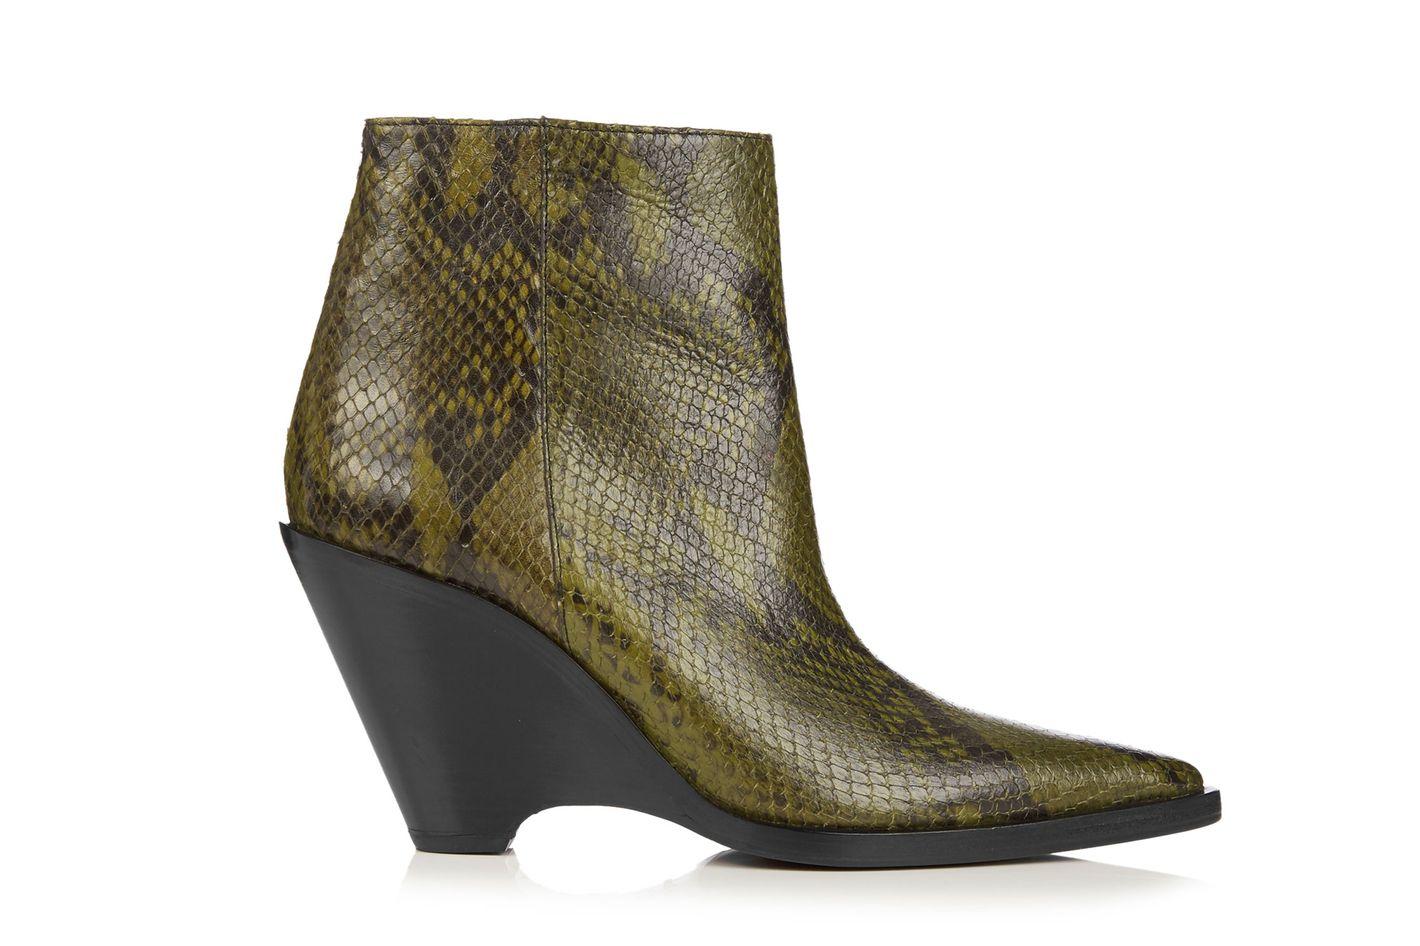 Acne Studios 'Caroline' Boots